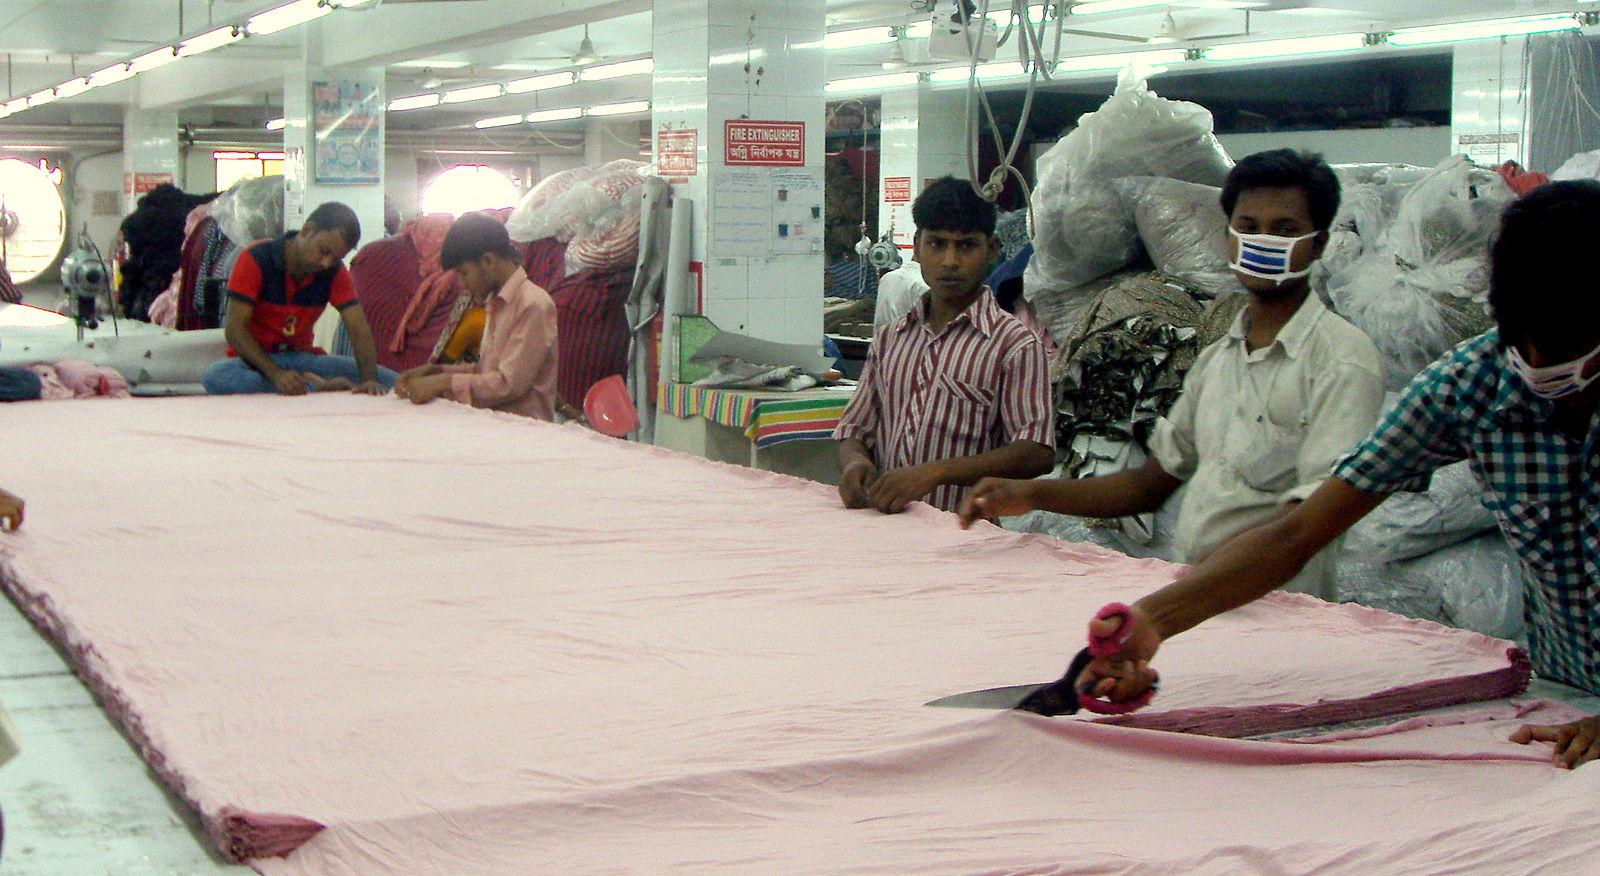 knit_fabric_cutting_in_a_rmg_factory_of_bangladesh.jpg